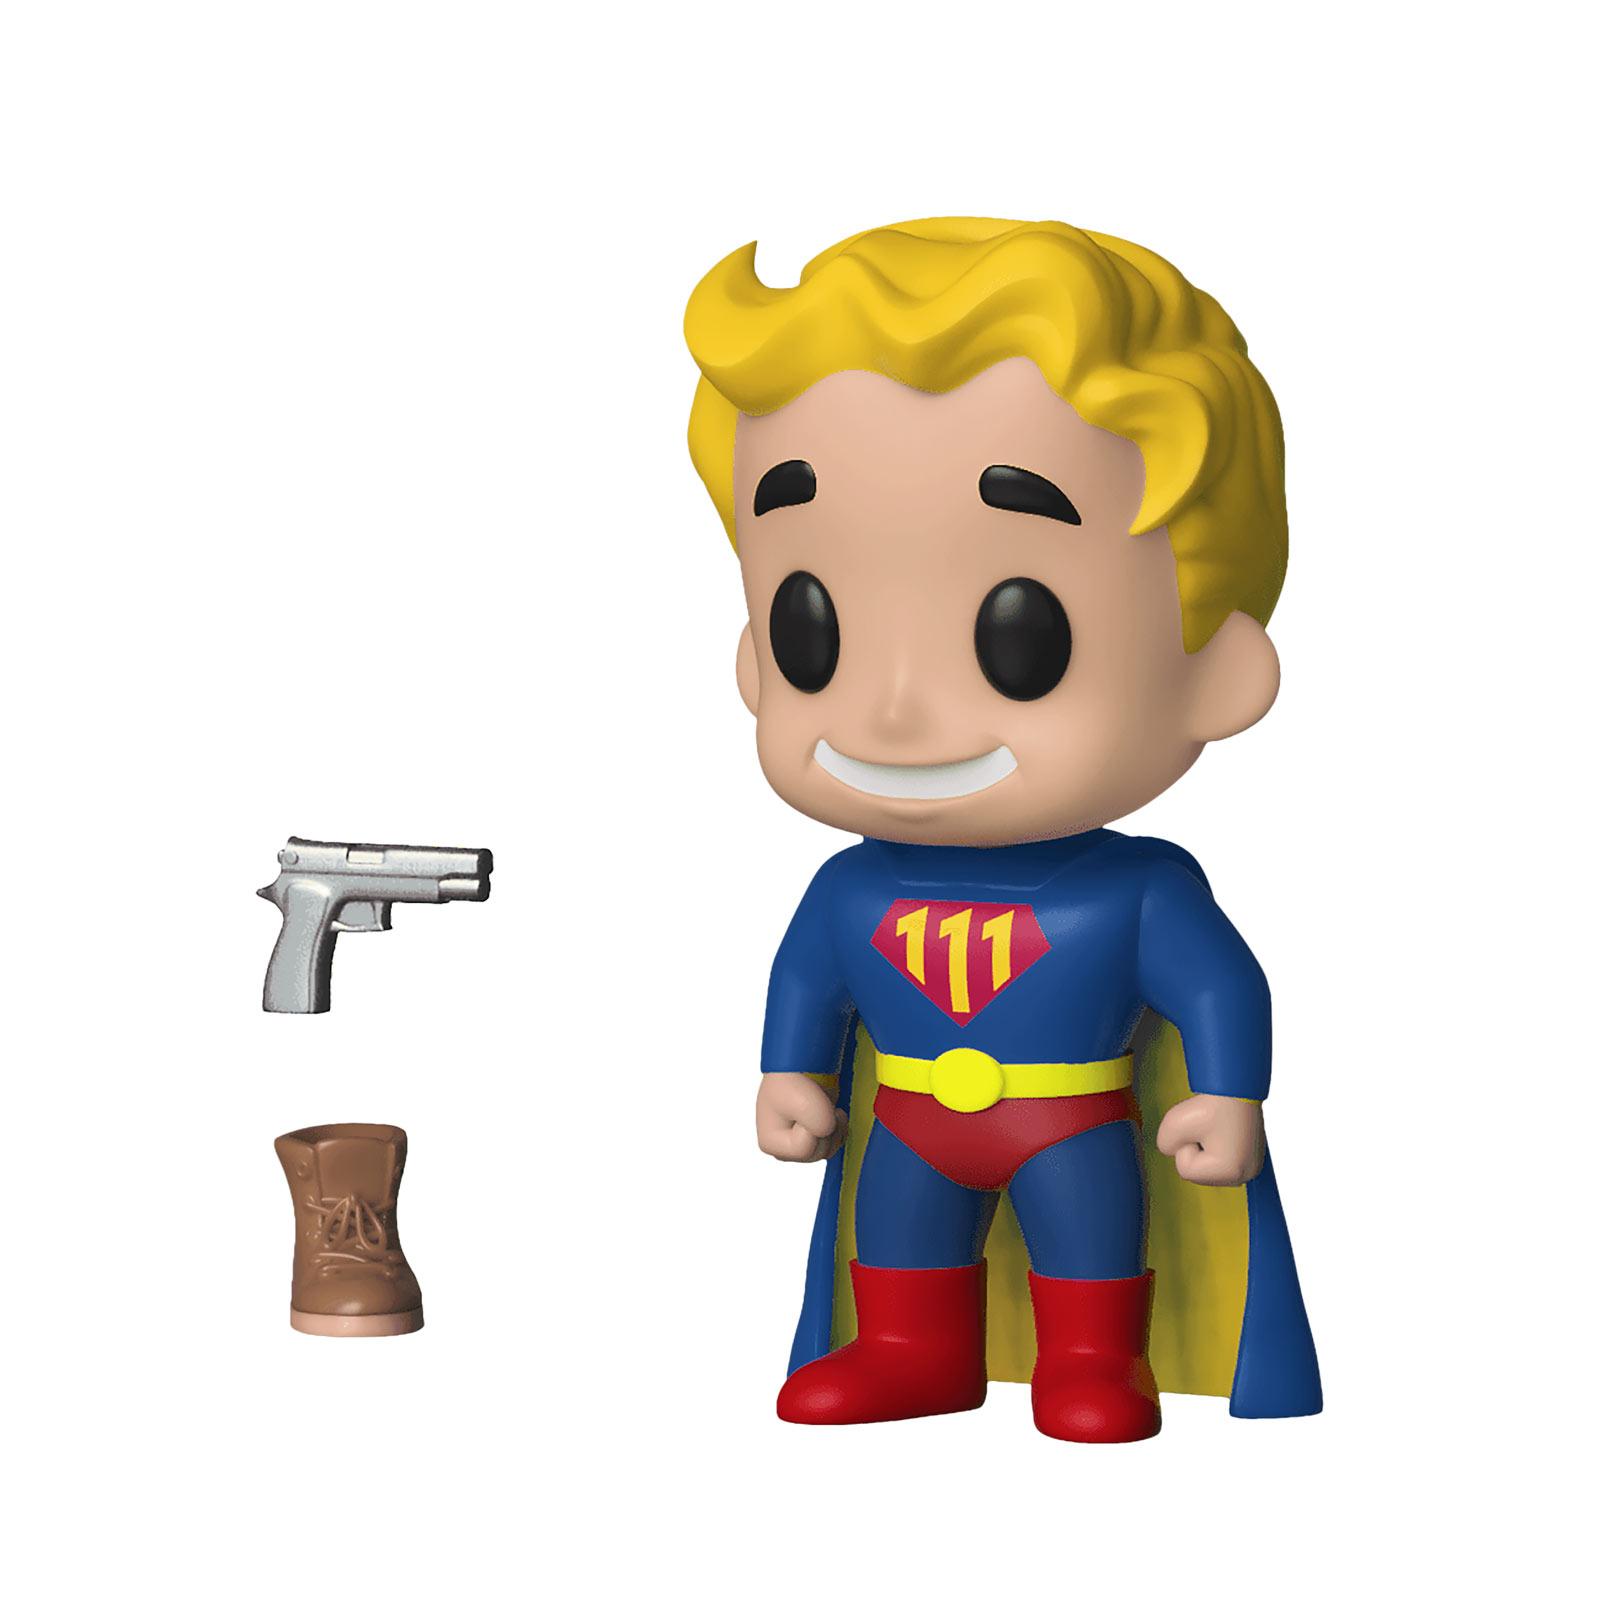 Fallout - Vault Boy Toughness Funko Five Star Figur